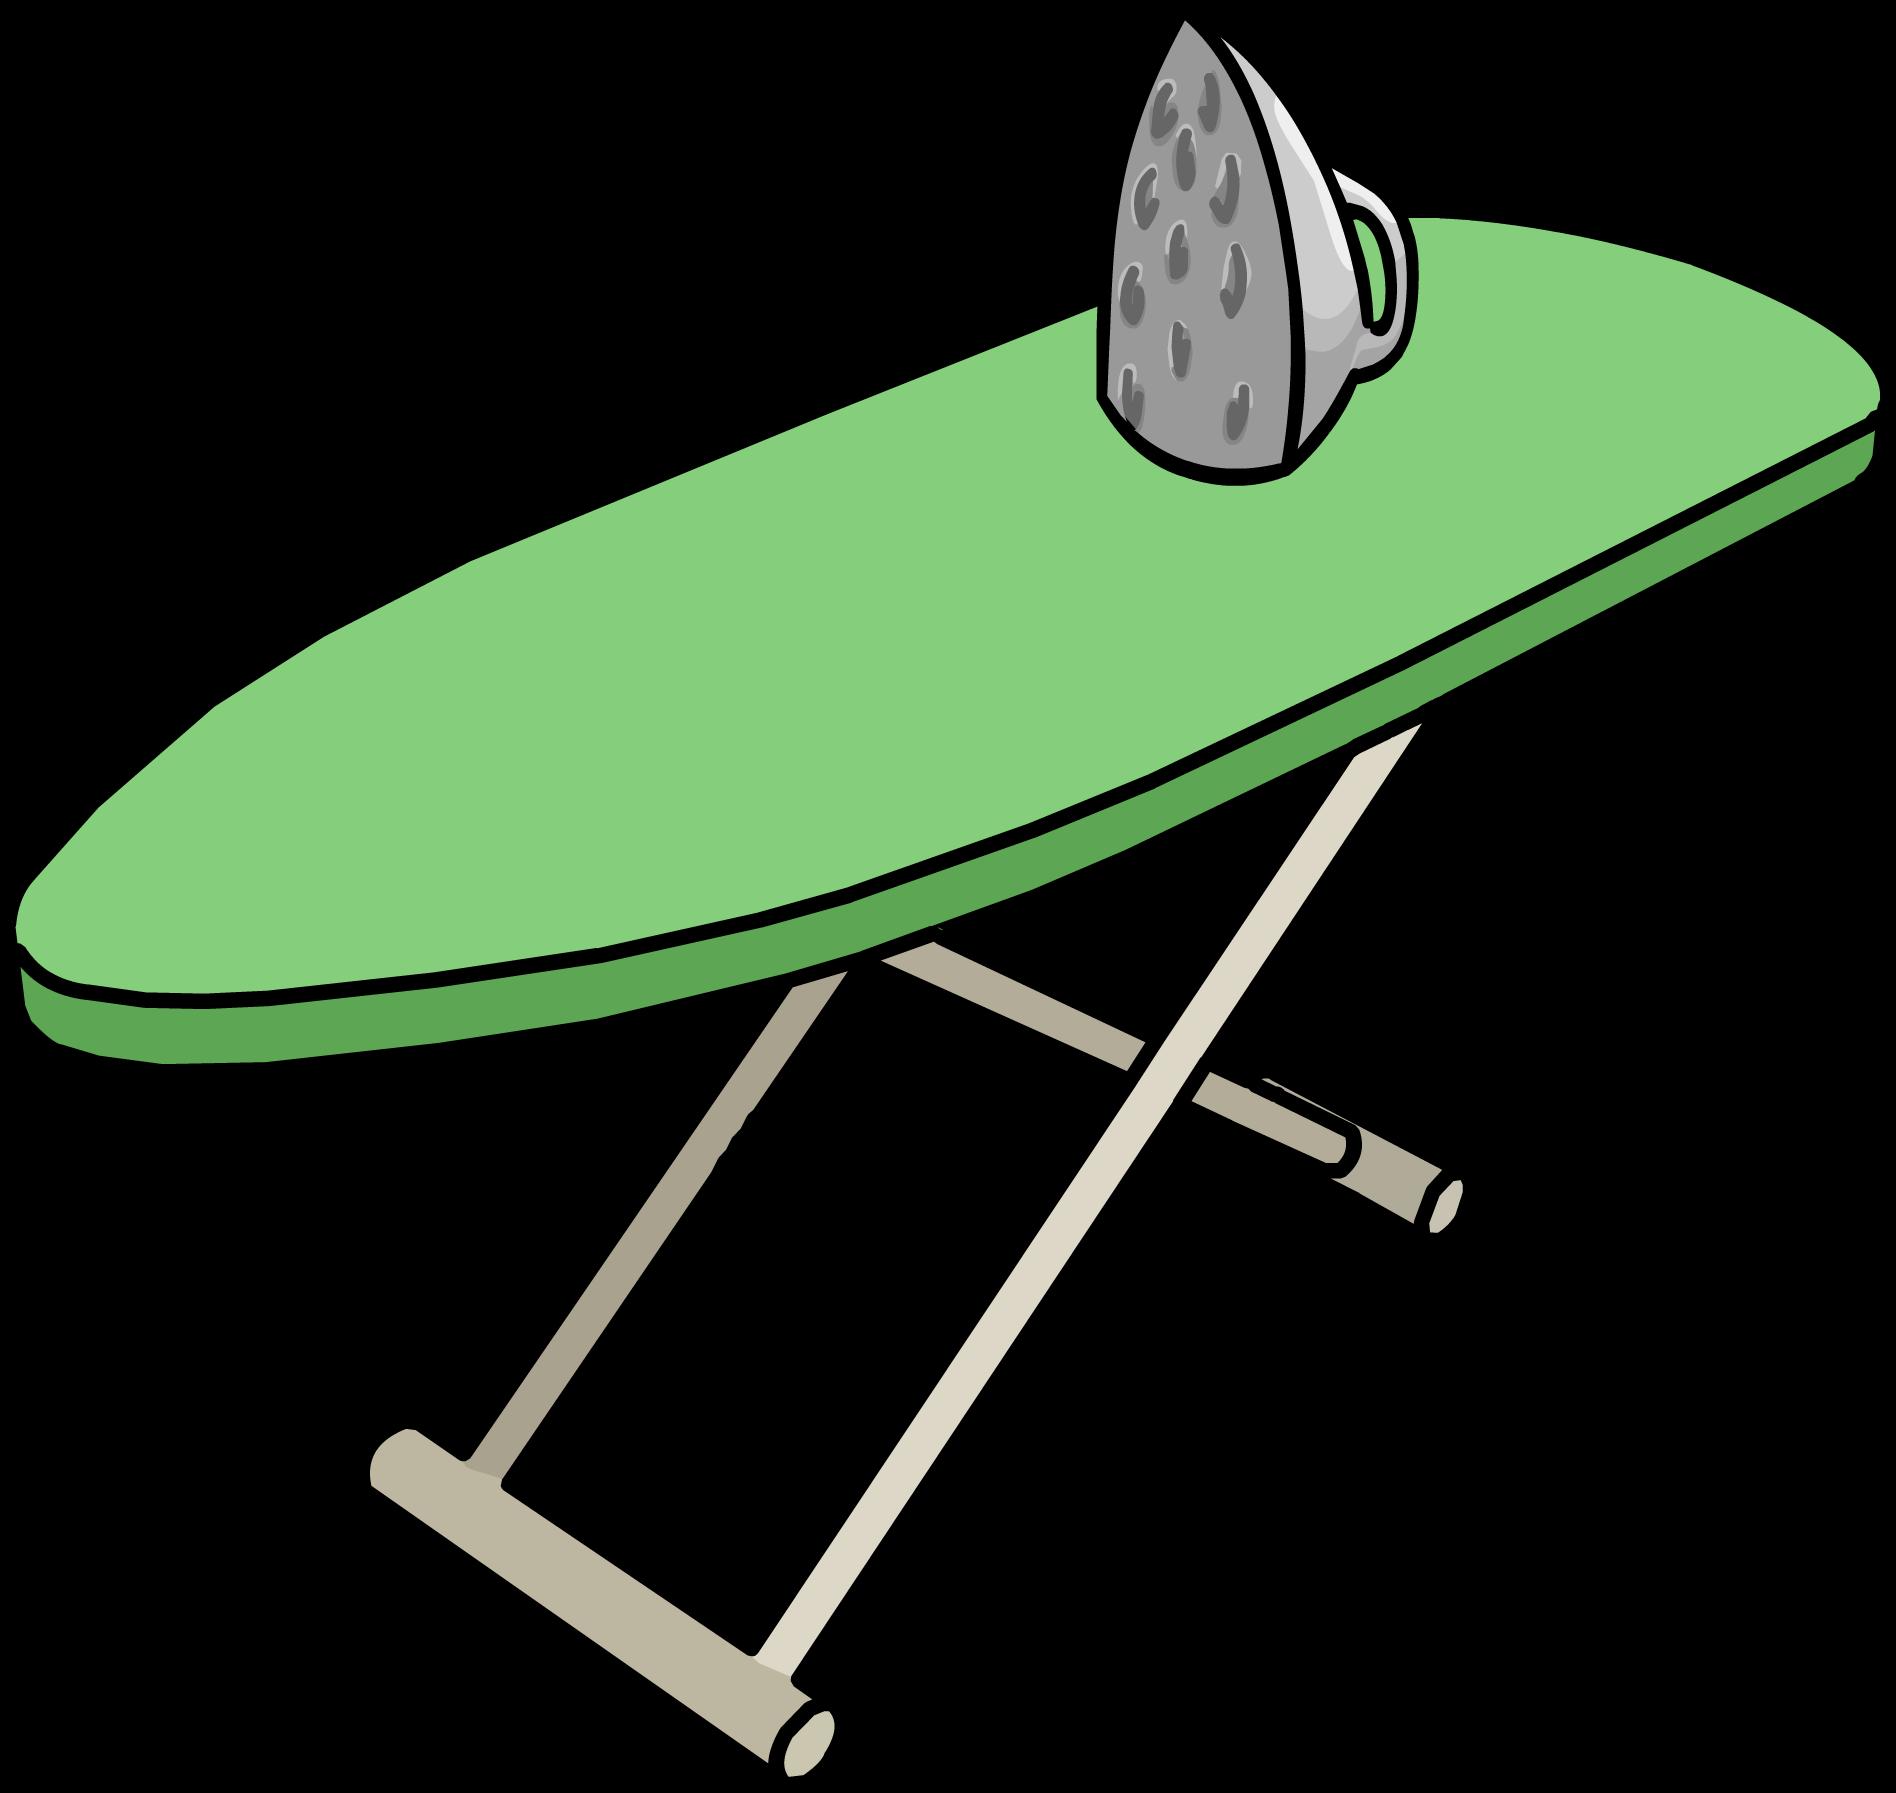 Iron clipart iron board, Picture #1421836 iron clipart iron.